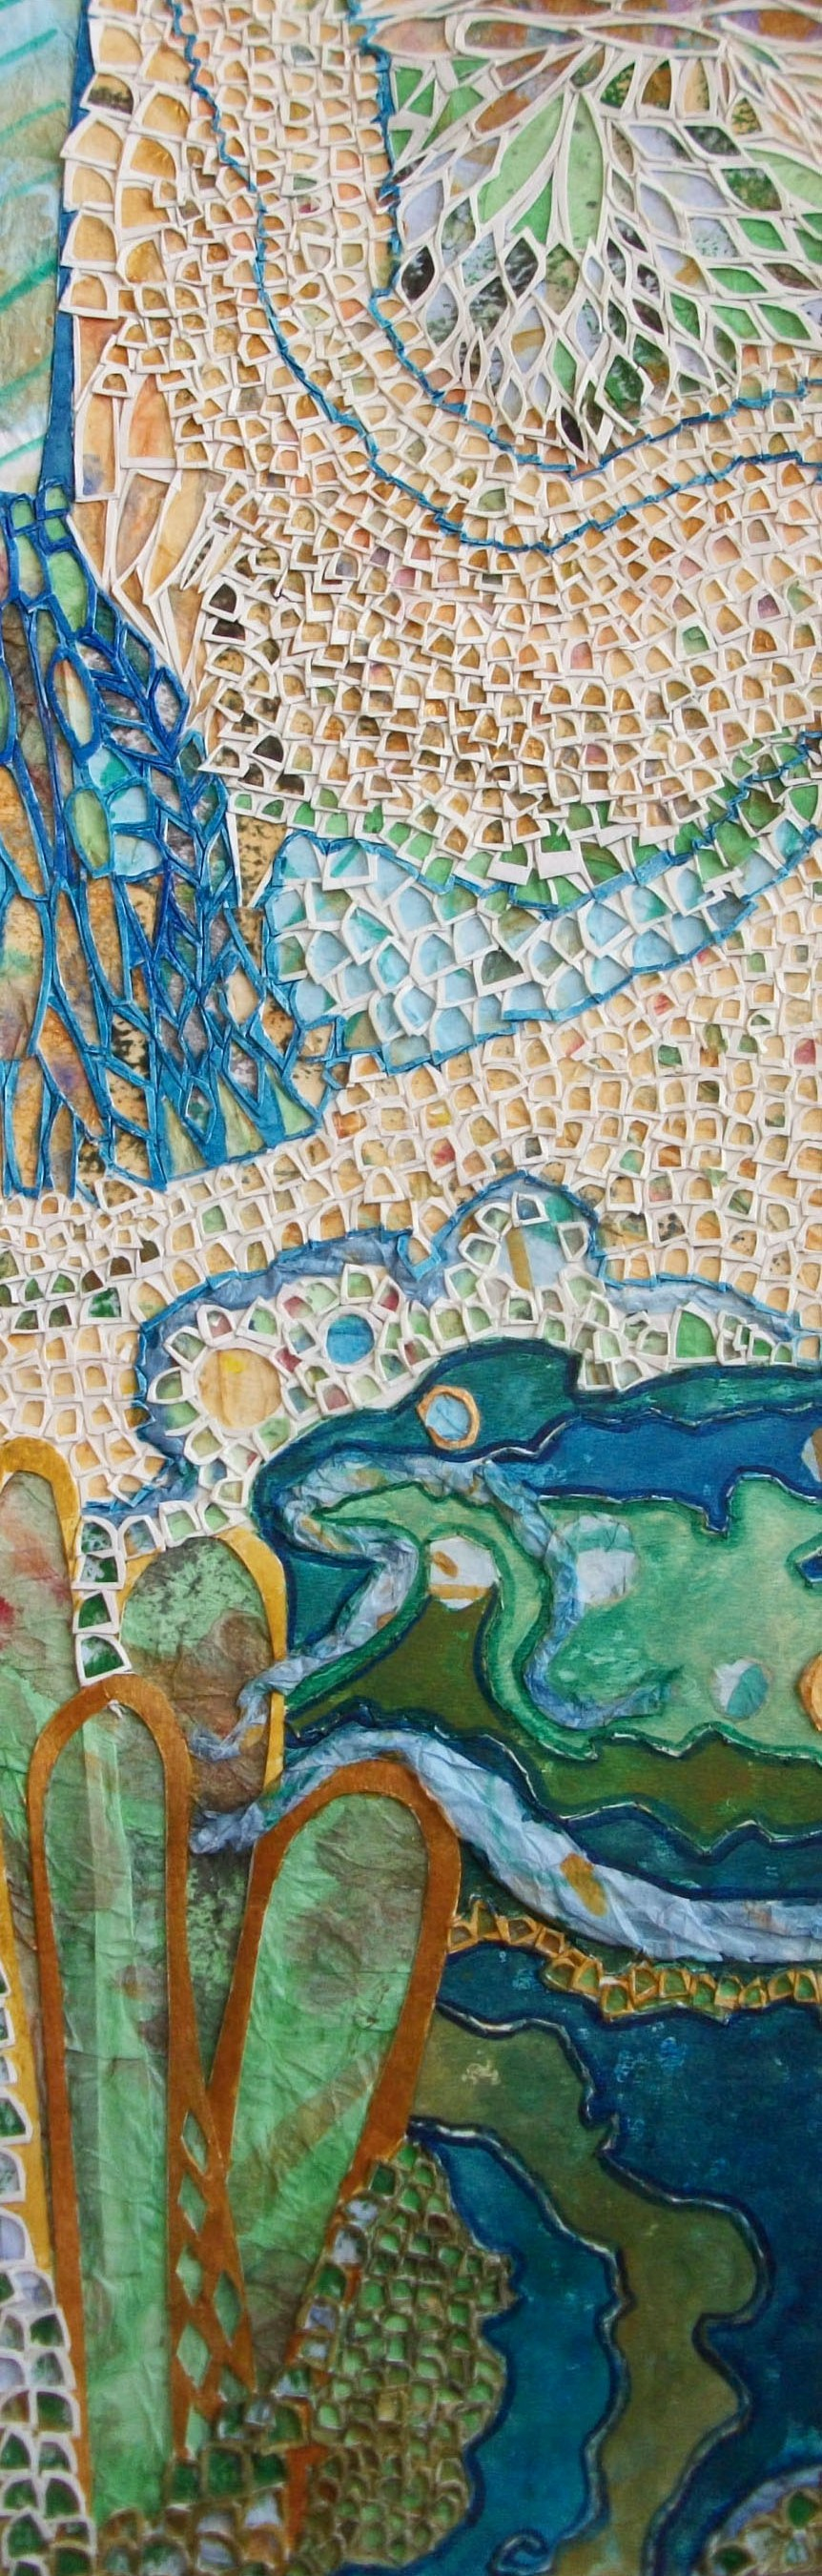 Susan Dorsey_Coral Abstract